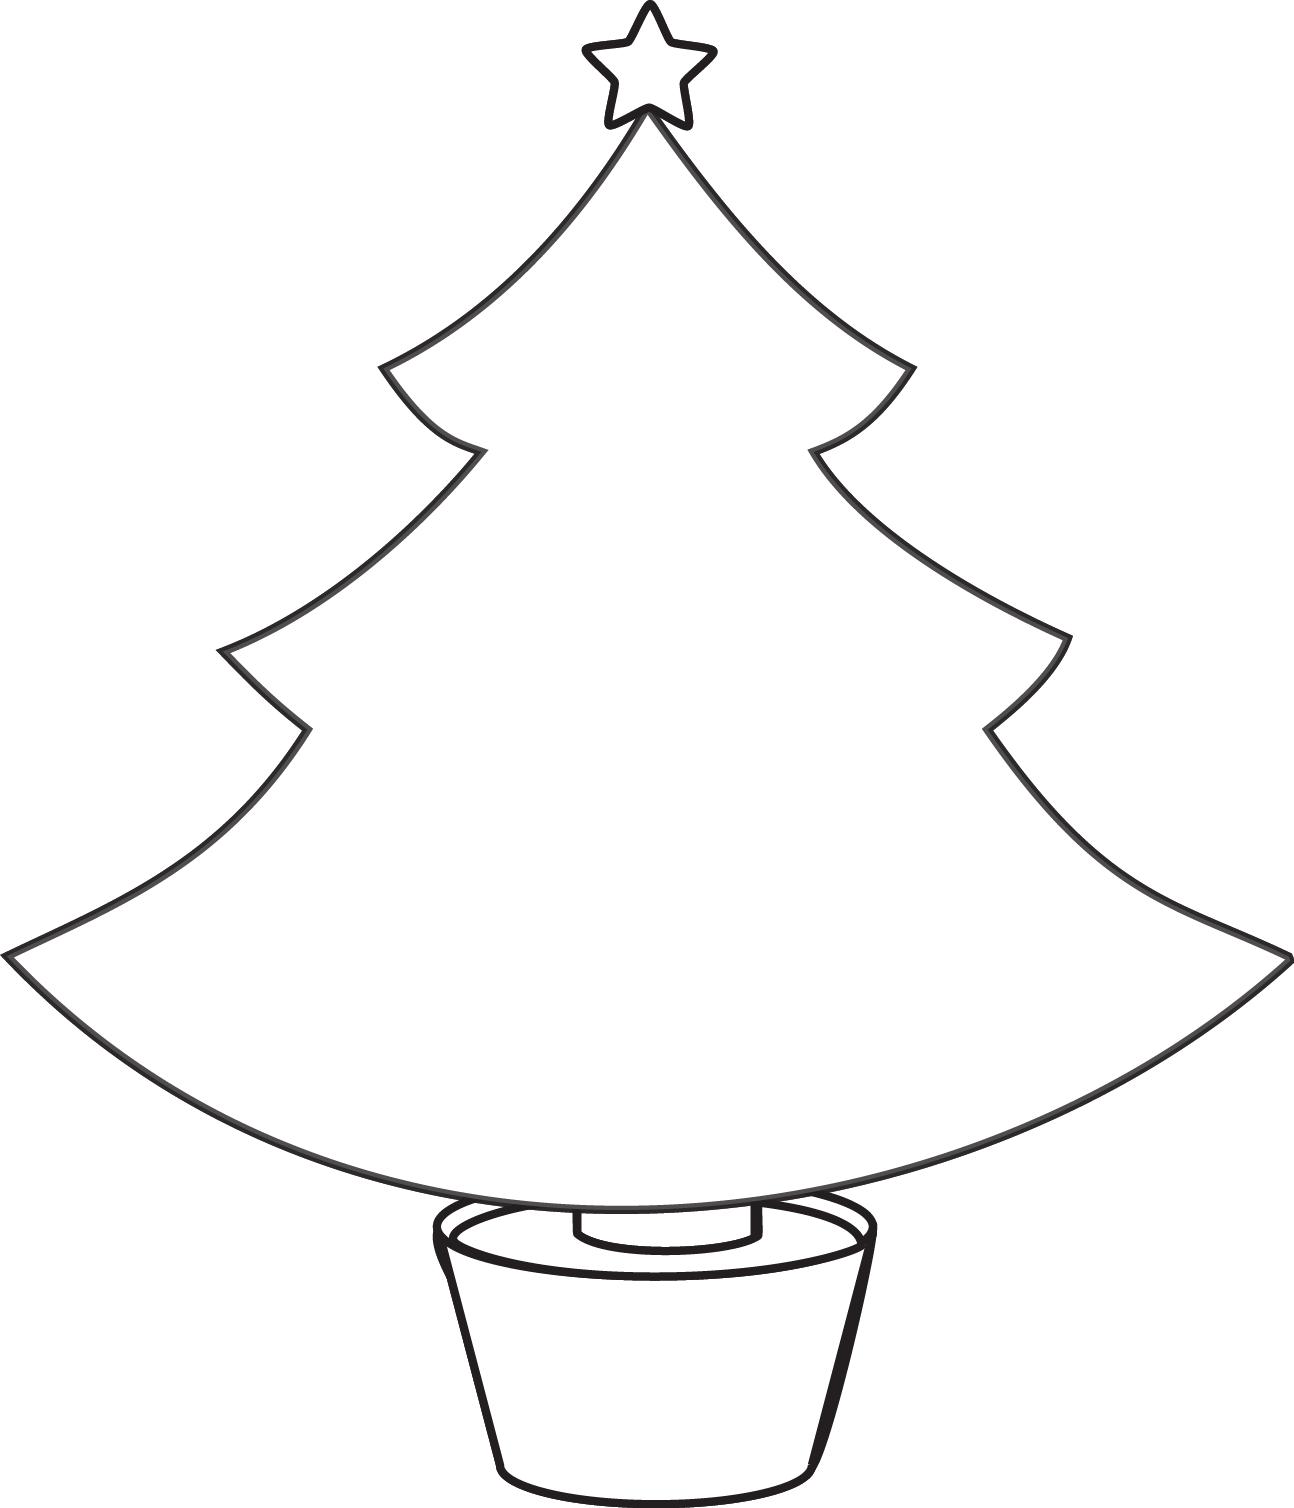 Christmas tree lighting black and white clipart vector download Free Christmas Tree Black And White Clipart, Download Free Clip Art ... vector download